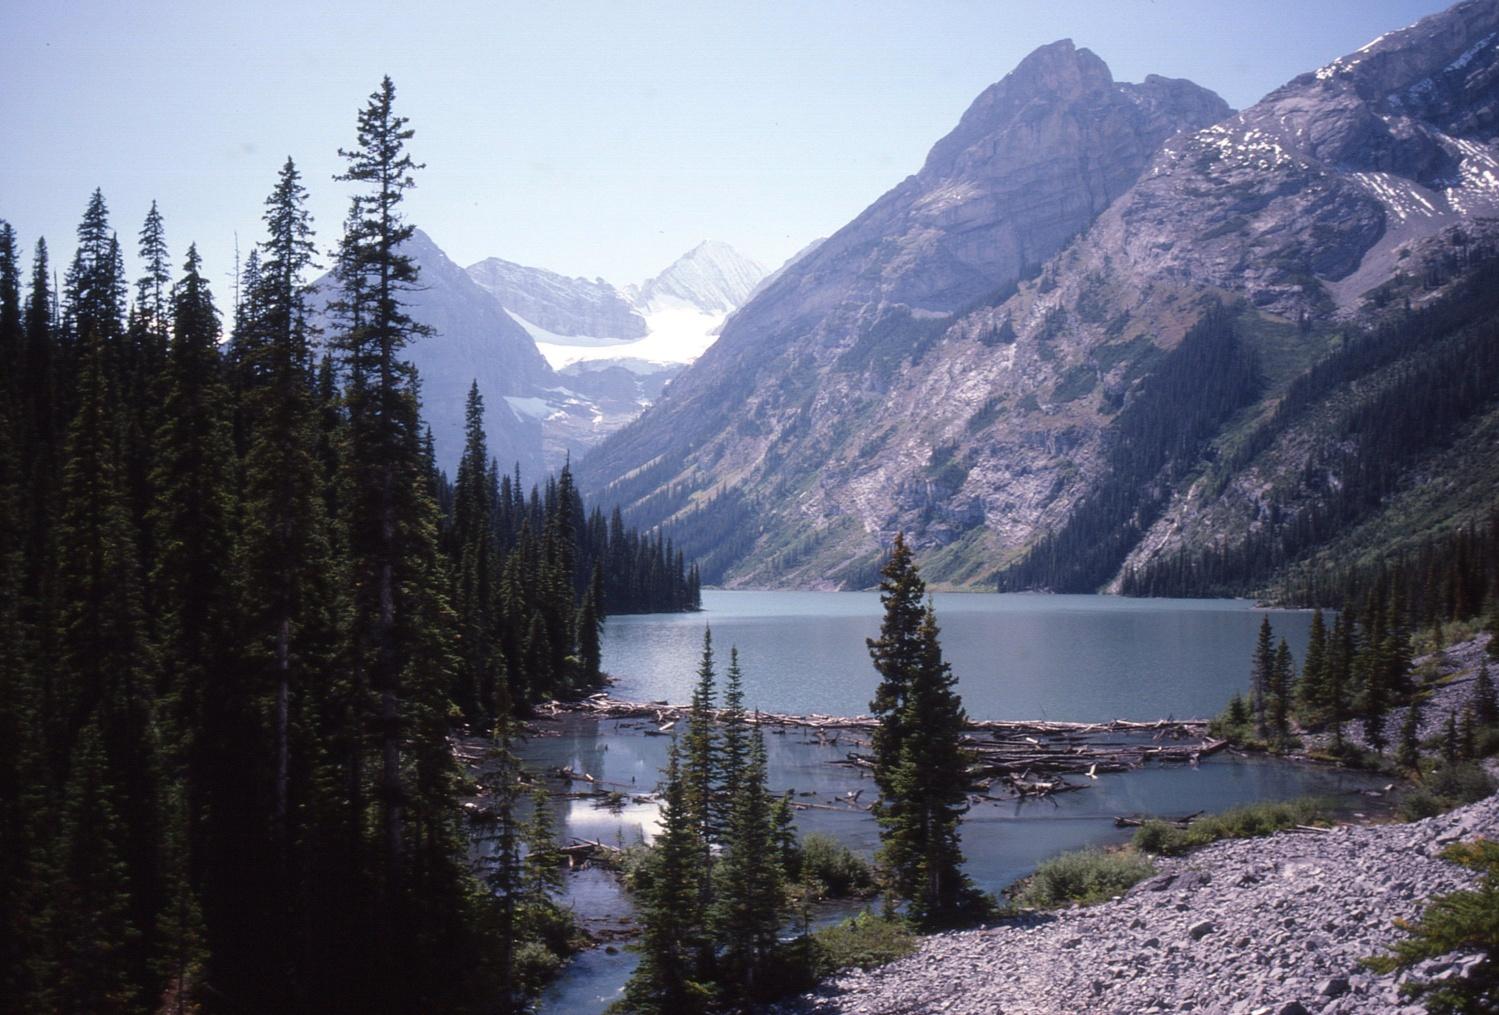 Elk Lakes' refurbished trail system